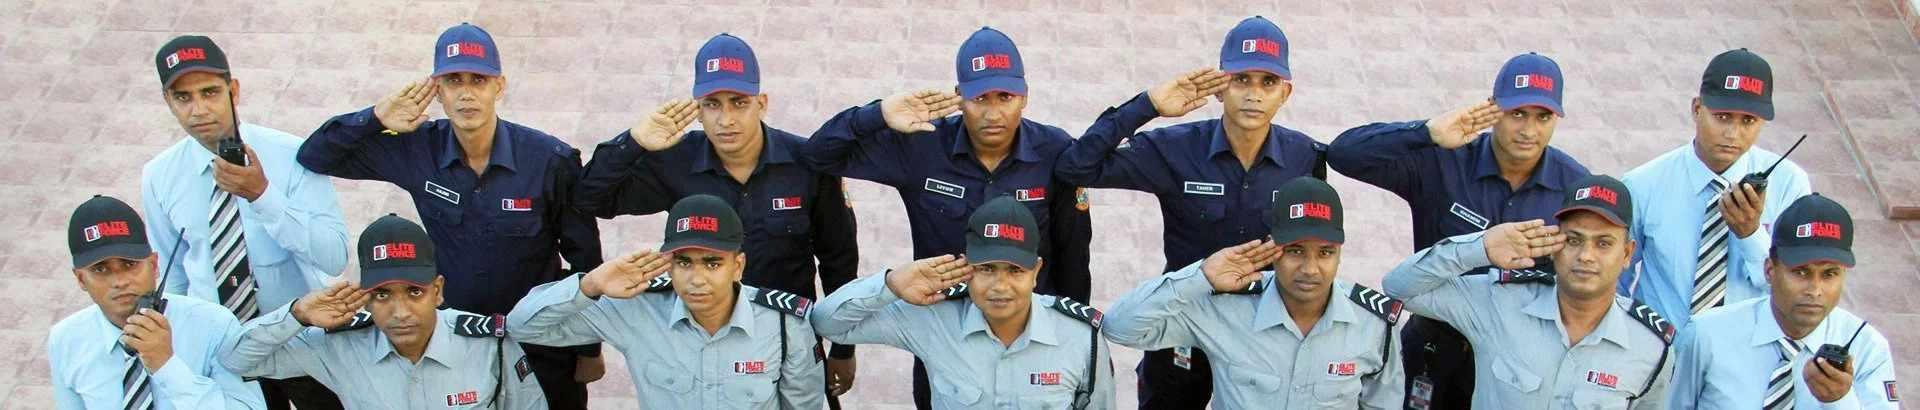 Elite Force Guard Saluting